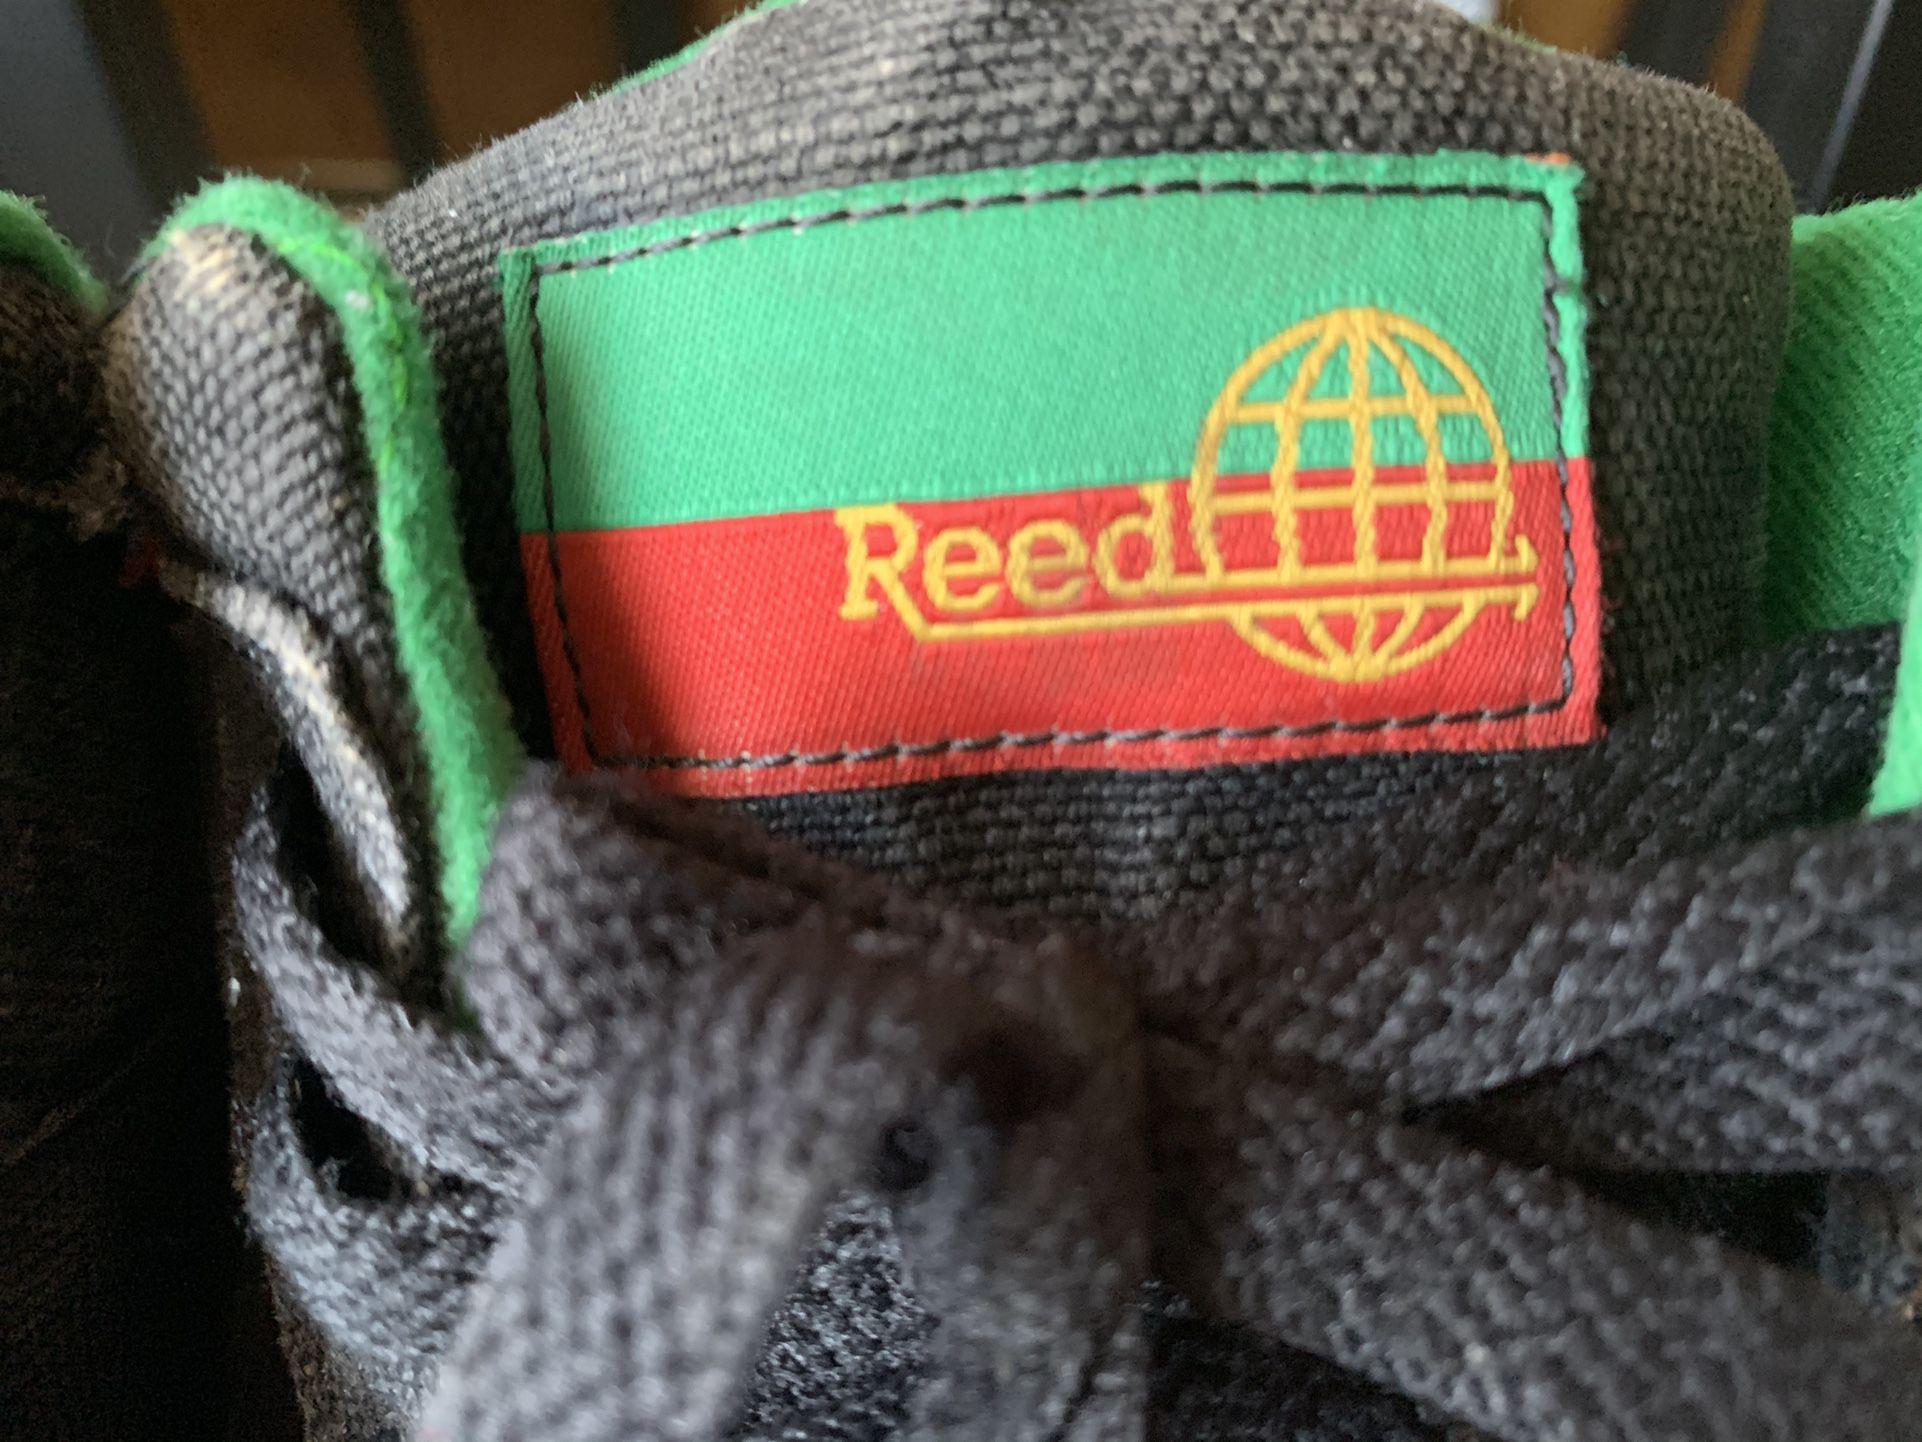 Ipath - Reed Hemp Shoes - Size 13 (Rare , Vintage)